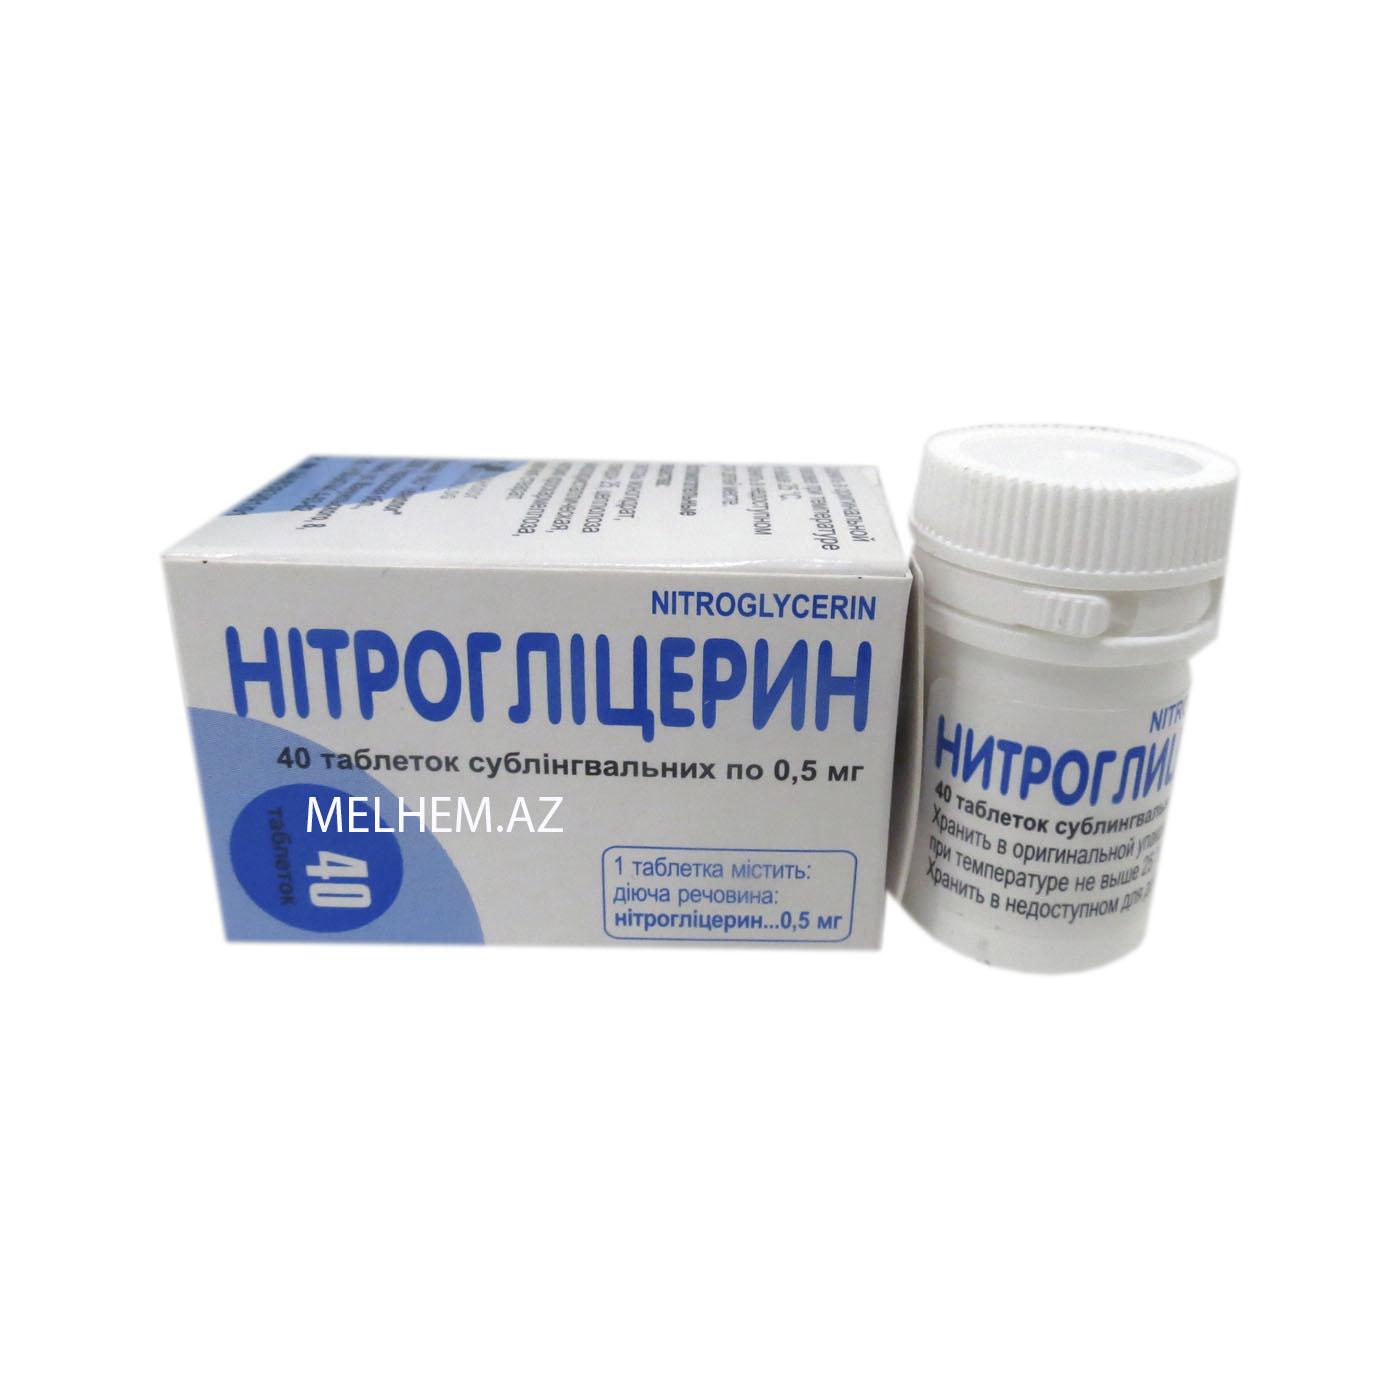 NITROQLISERIN 0,5 MG